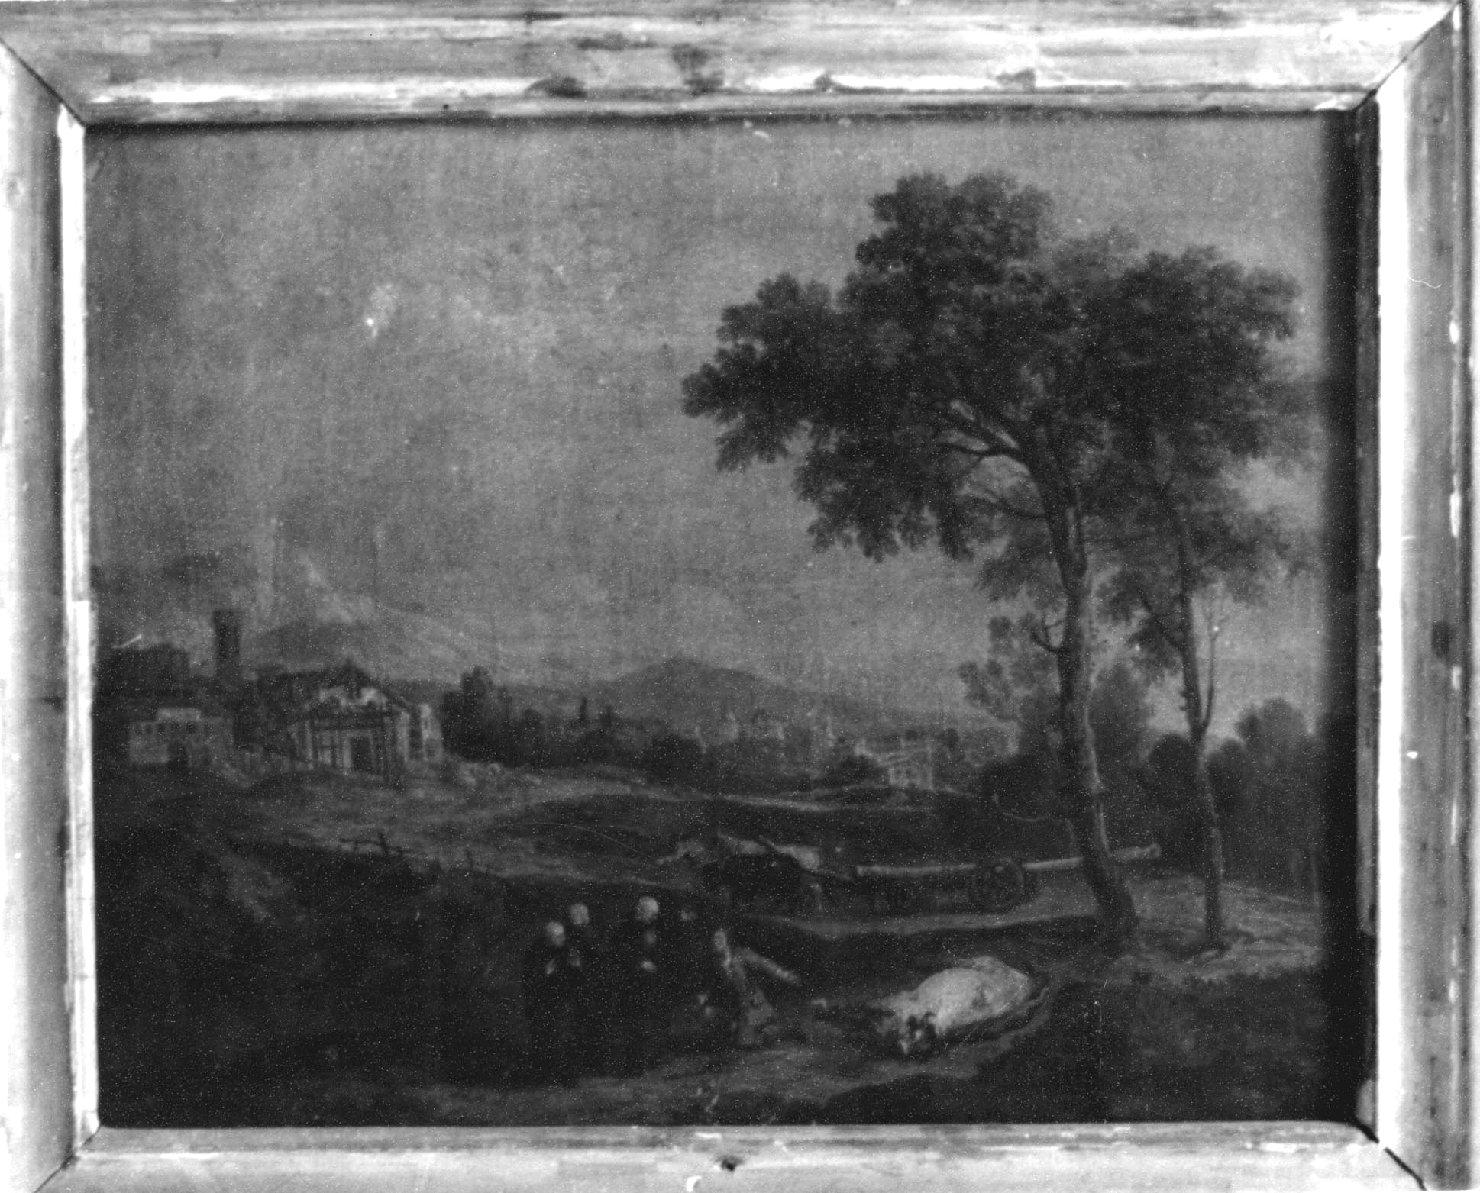 paesaggio rurale (dipinto, opera isolata) di Zuccarelli Francesco (sec. XVIII)